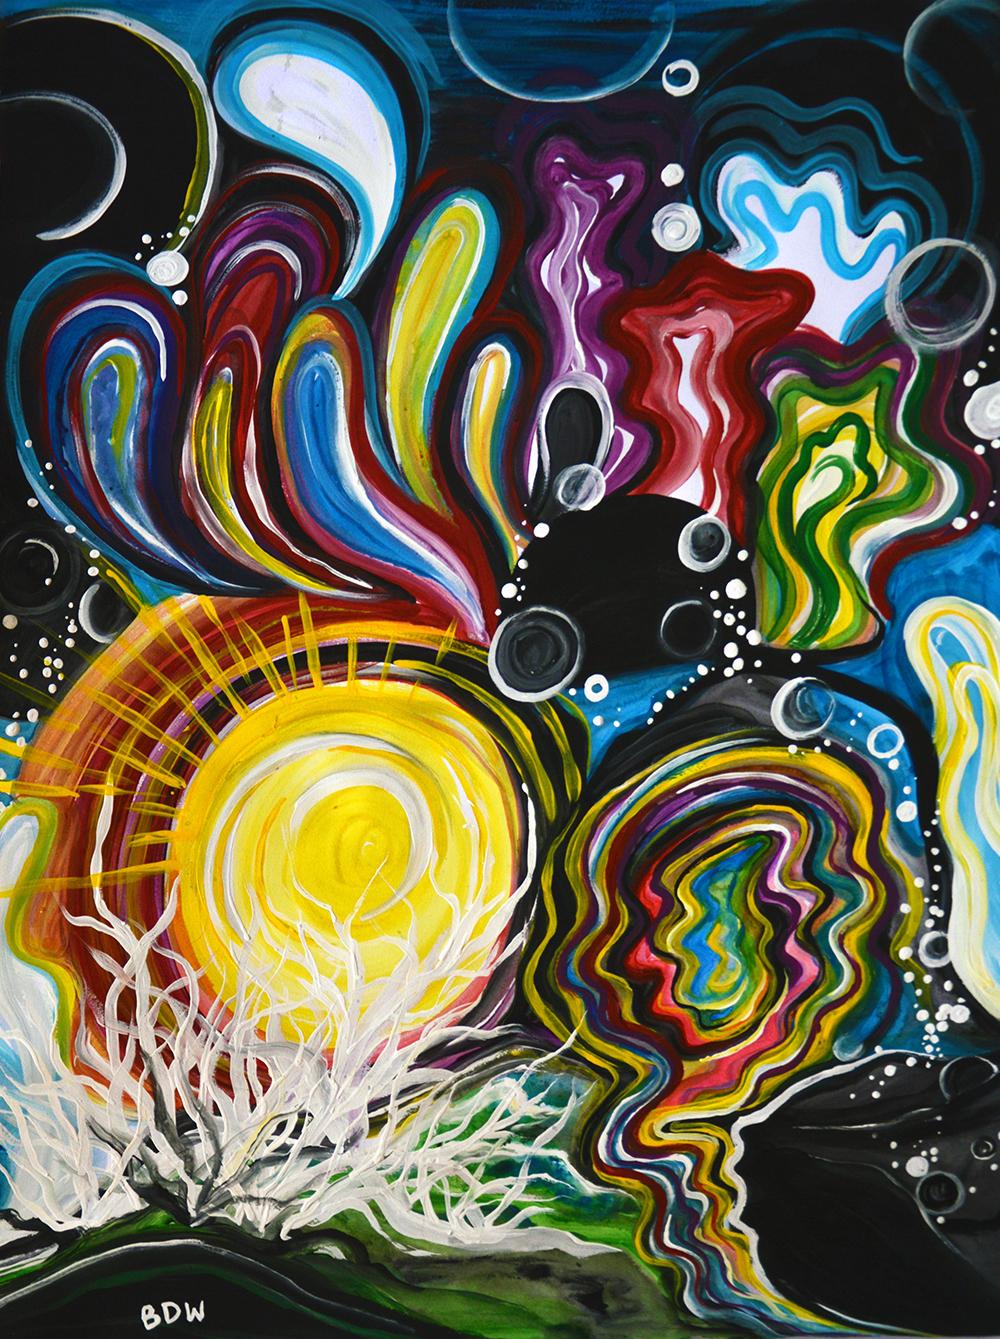 Luminous Lifeforms